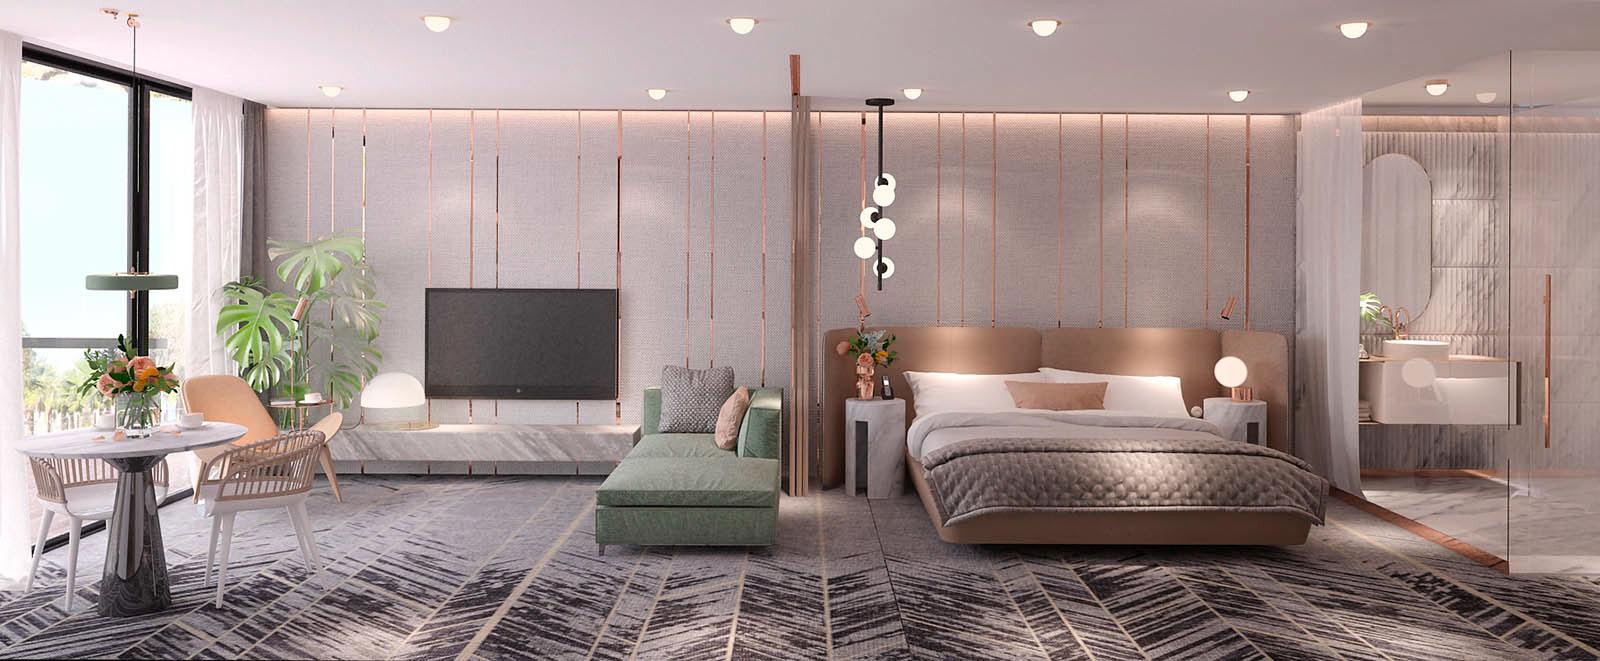 Slaapkamer ontwerp met koper en marmer | Slaapkamer ideeën